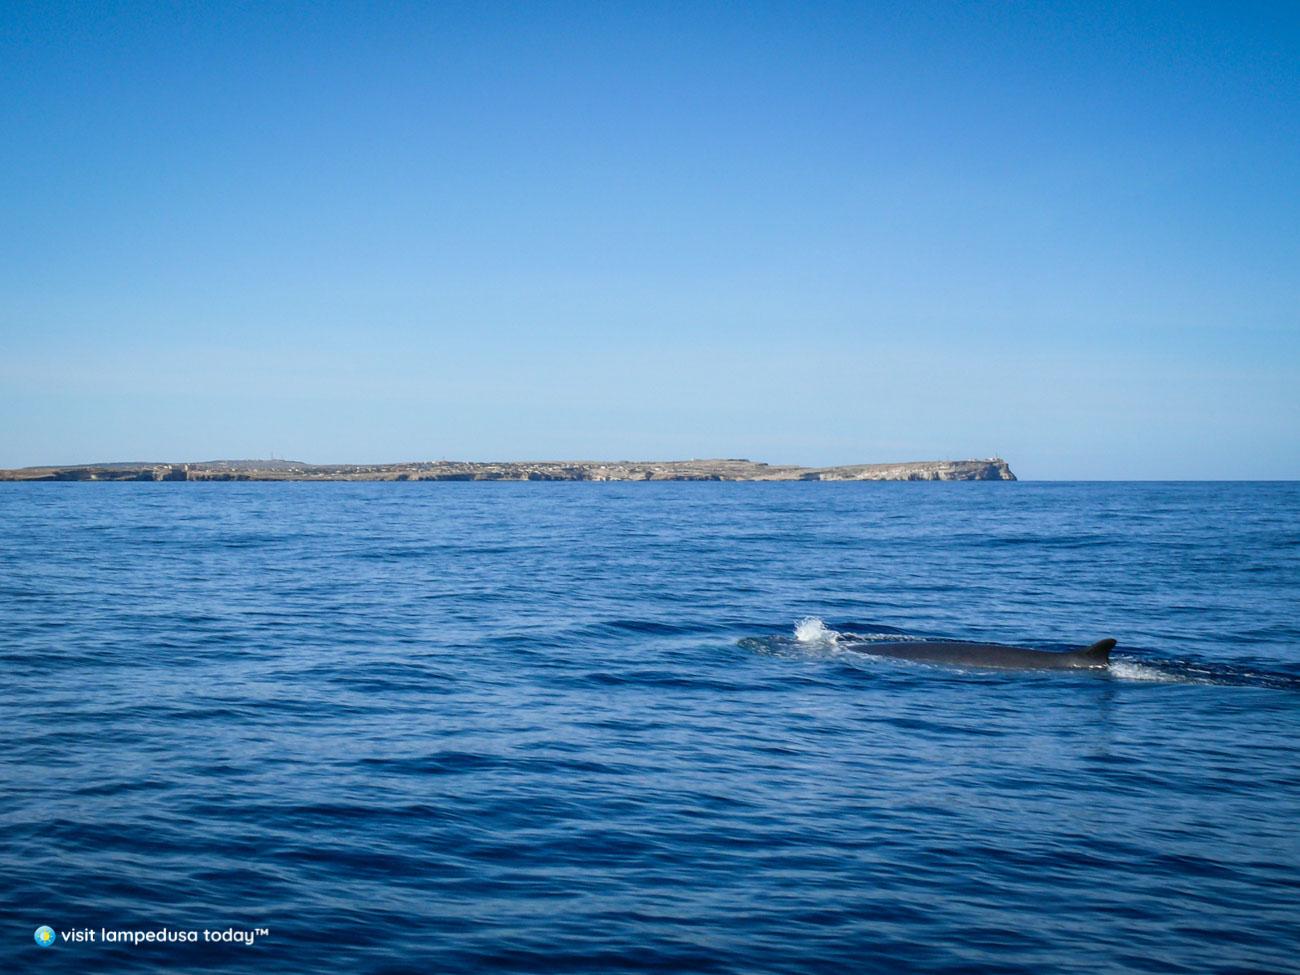 I tesori del Mediterraneo: I cetacei delle Pelagie